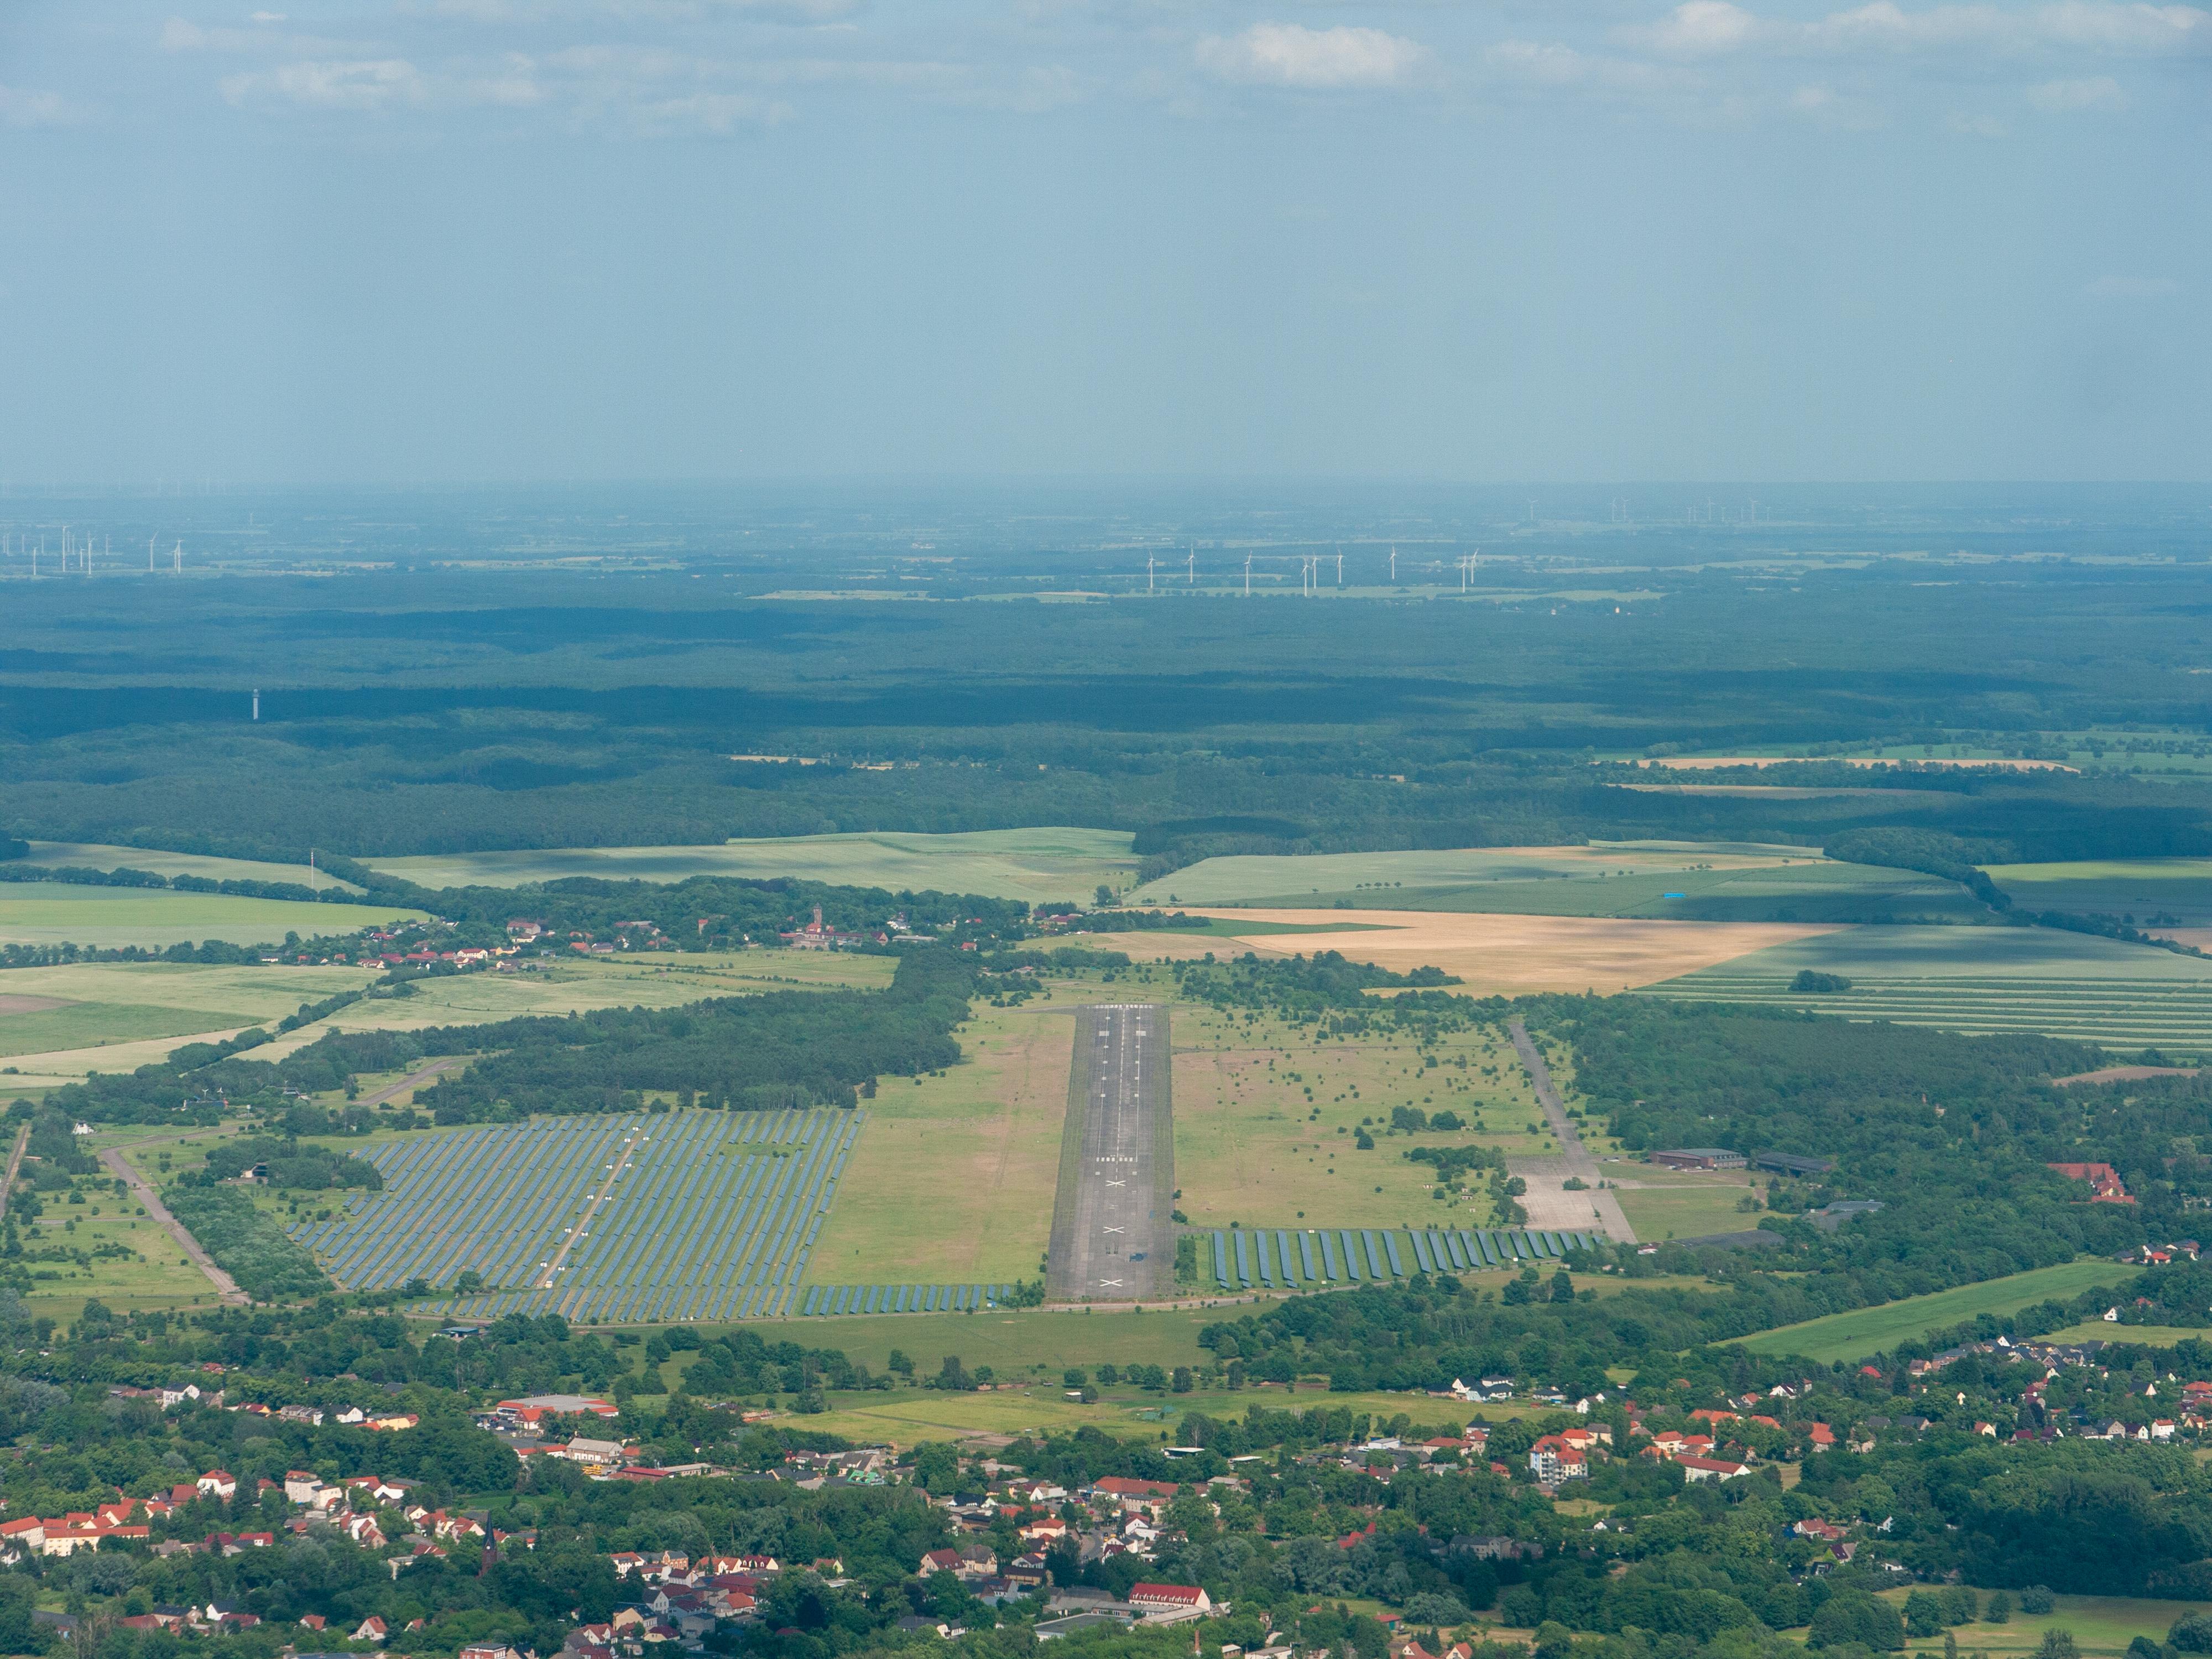 https://upload.wikimedia.org/wikipedia/commons/d/da/Aerial%2C_Werneuchen_%28_1090175%29.jpg